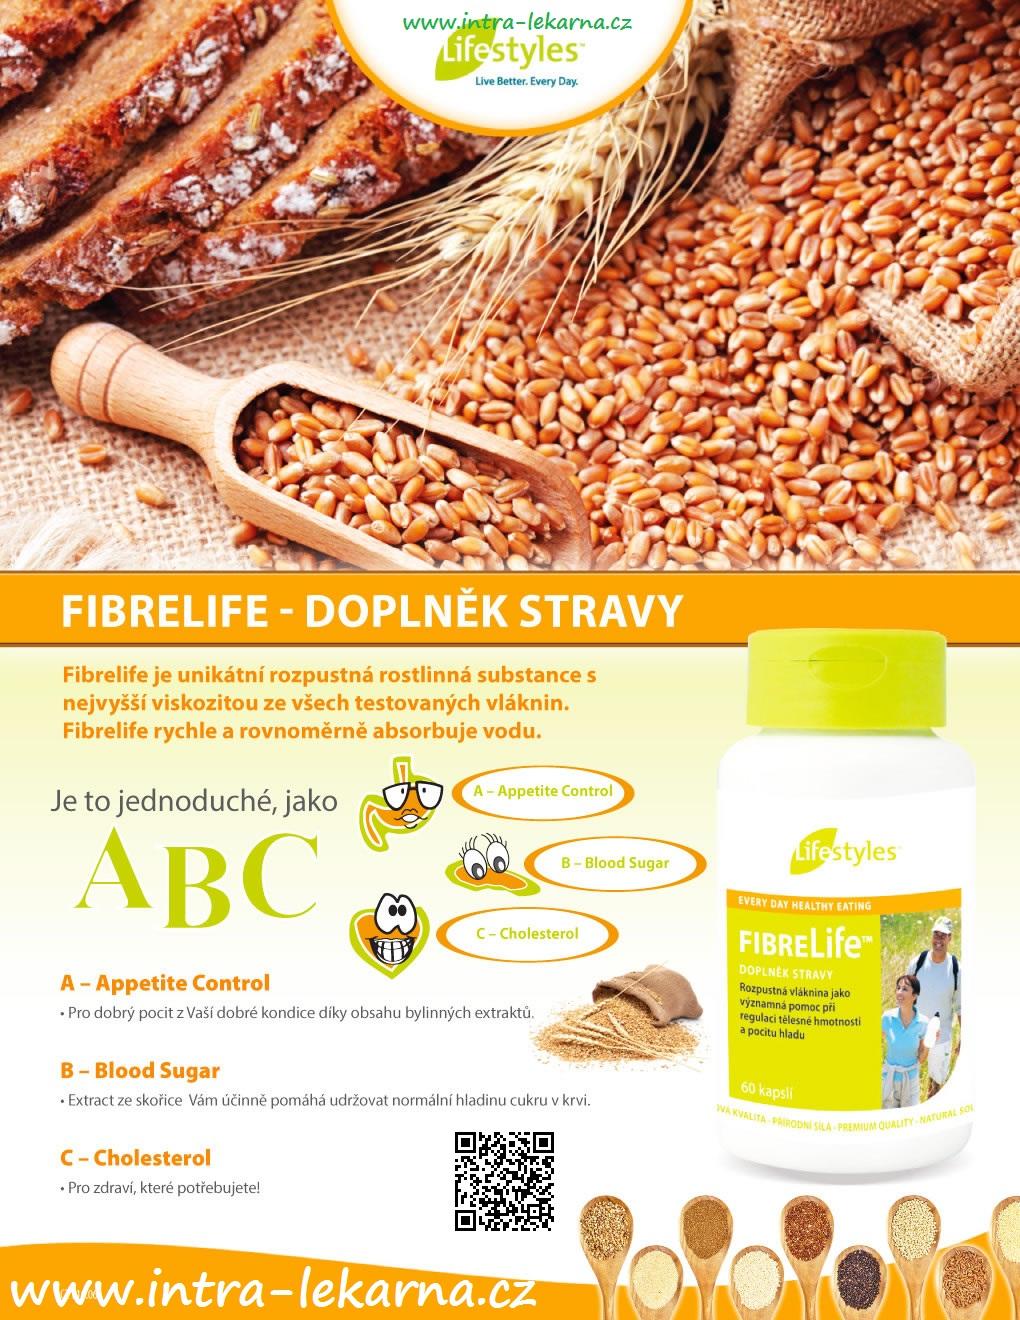 fibrelife-lifestyles-cz